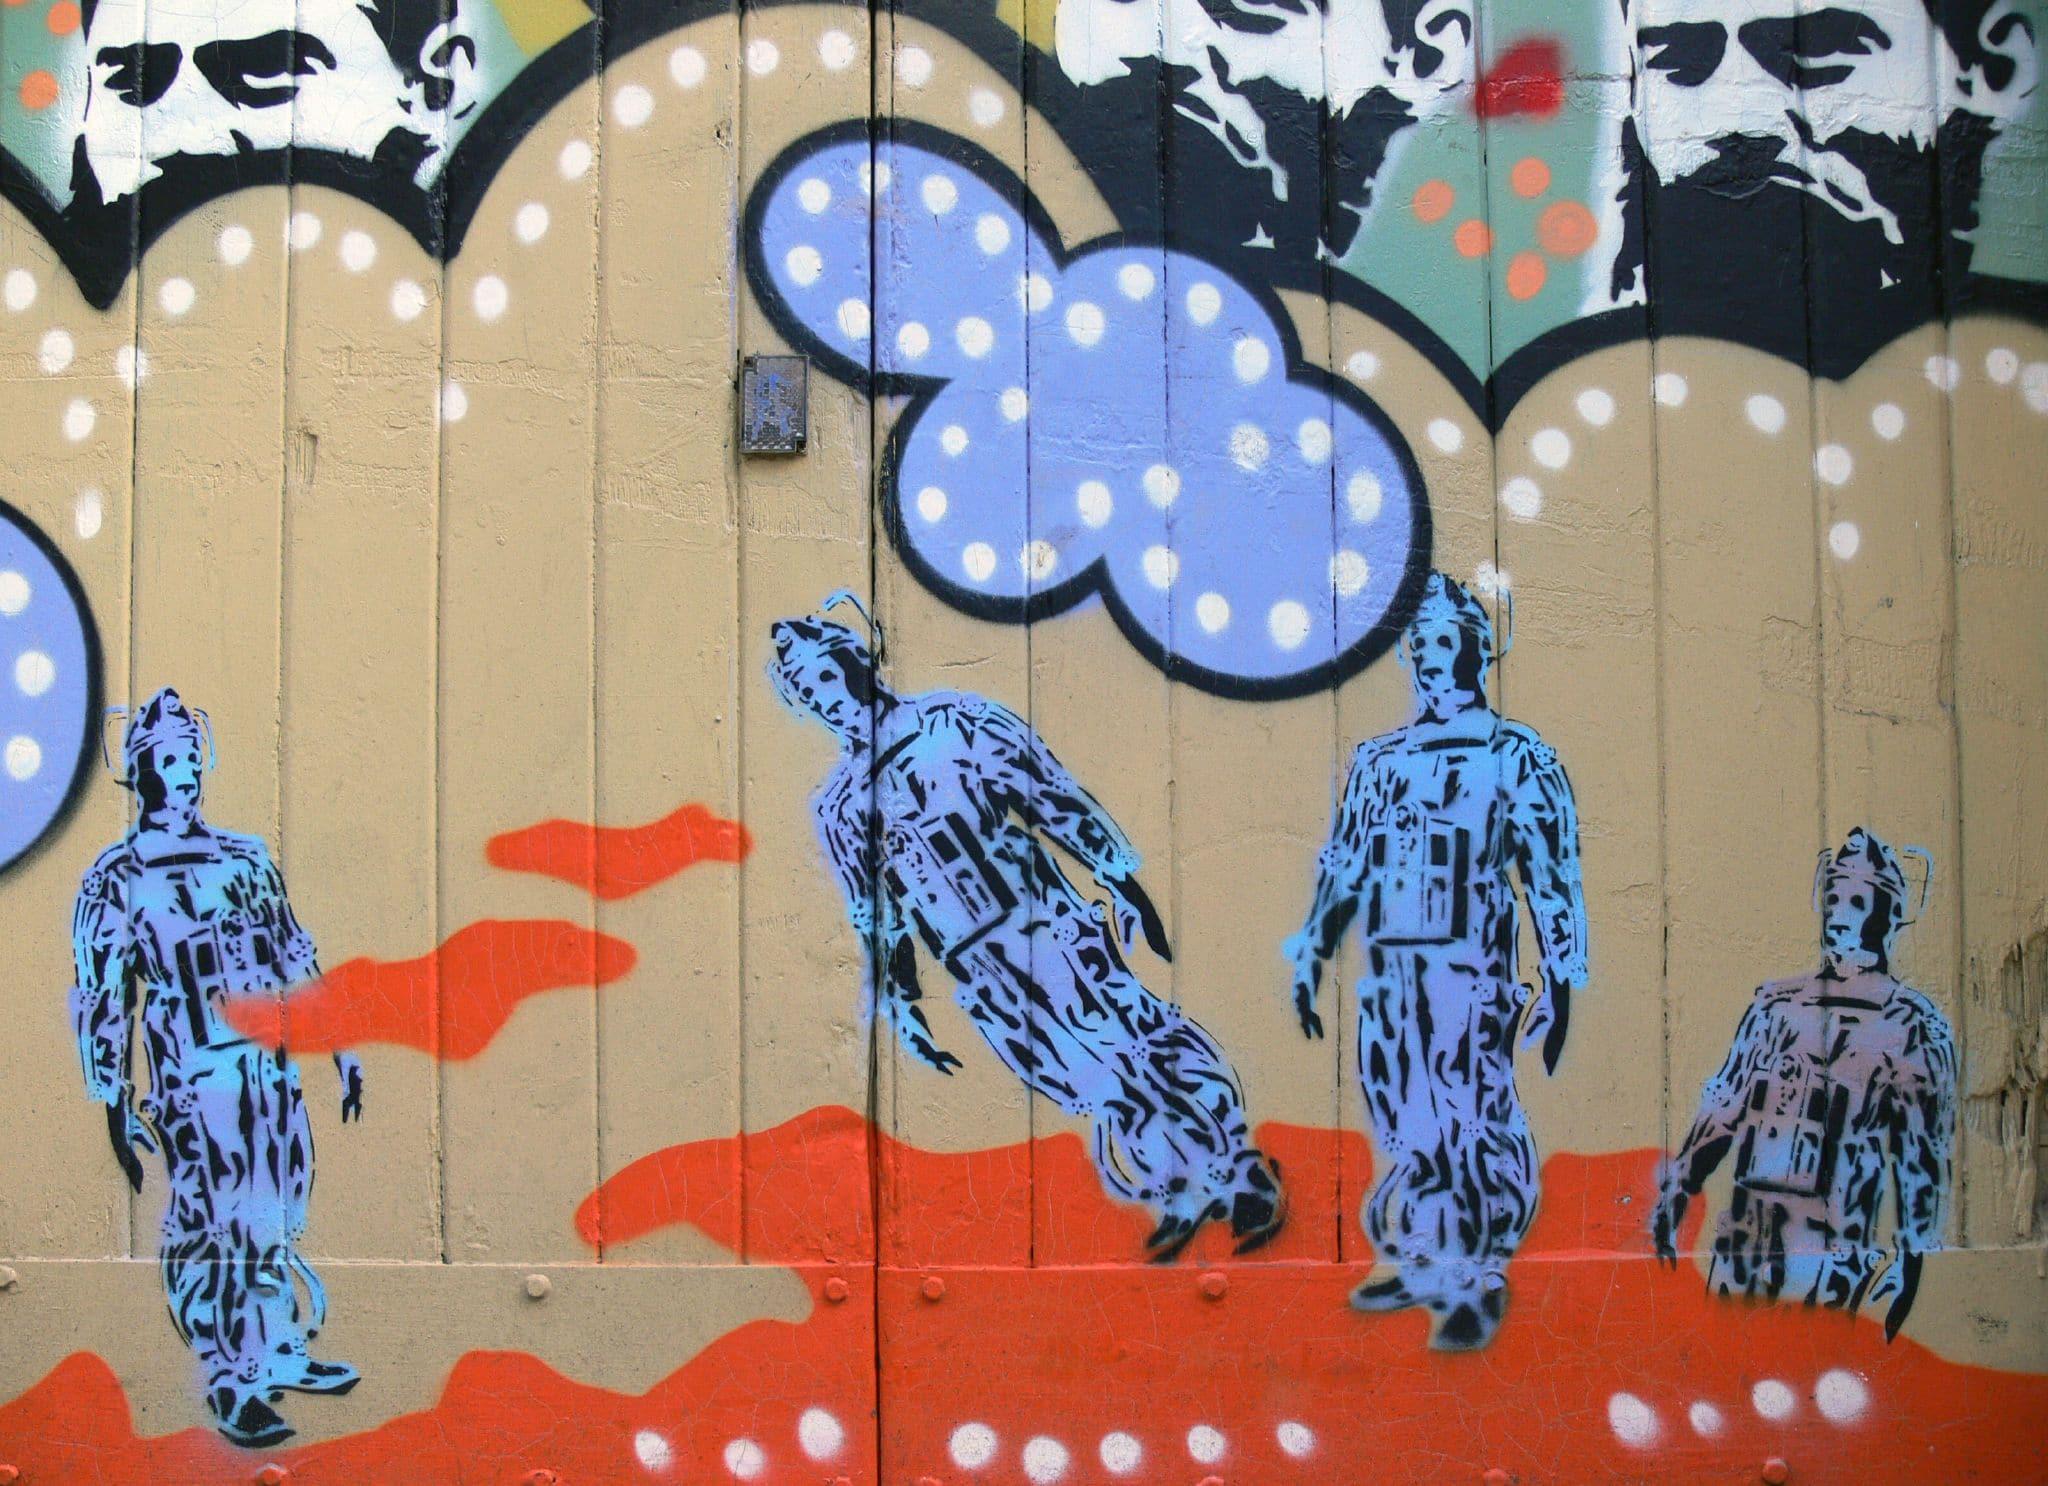 street-art-the-doctor-robot